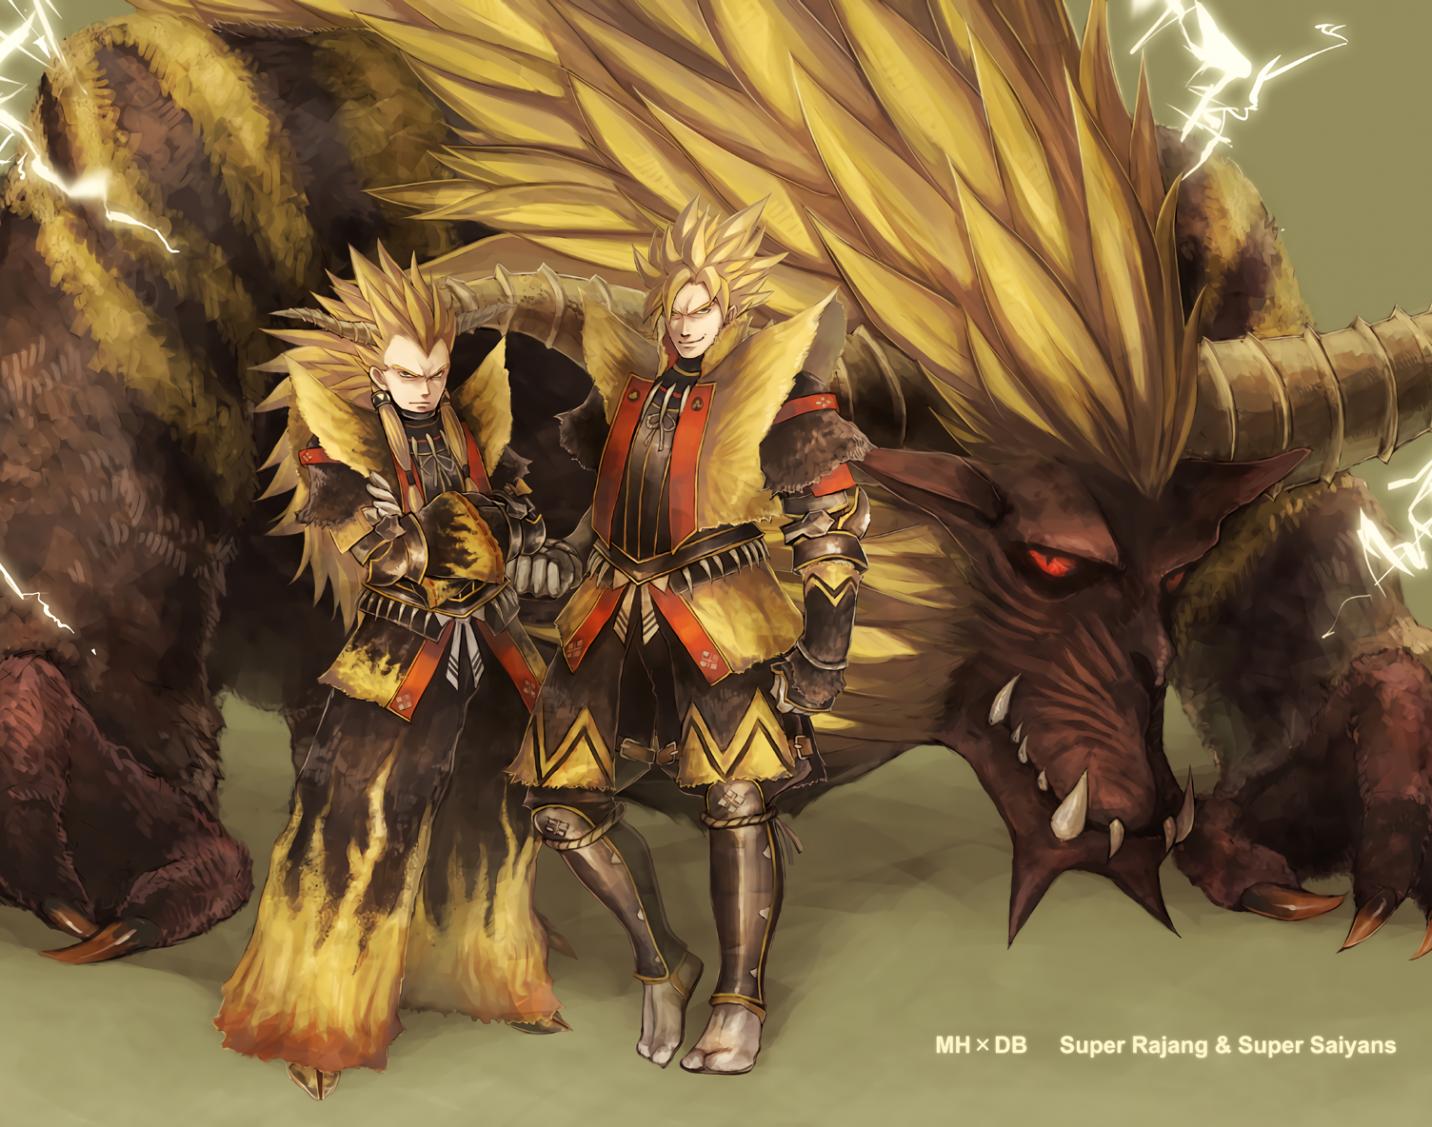 Download 1432x1127 Dragon Ball Z Goku Vegata Monster Hunter 1432x1127